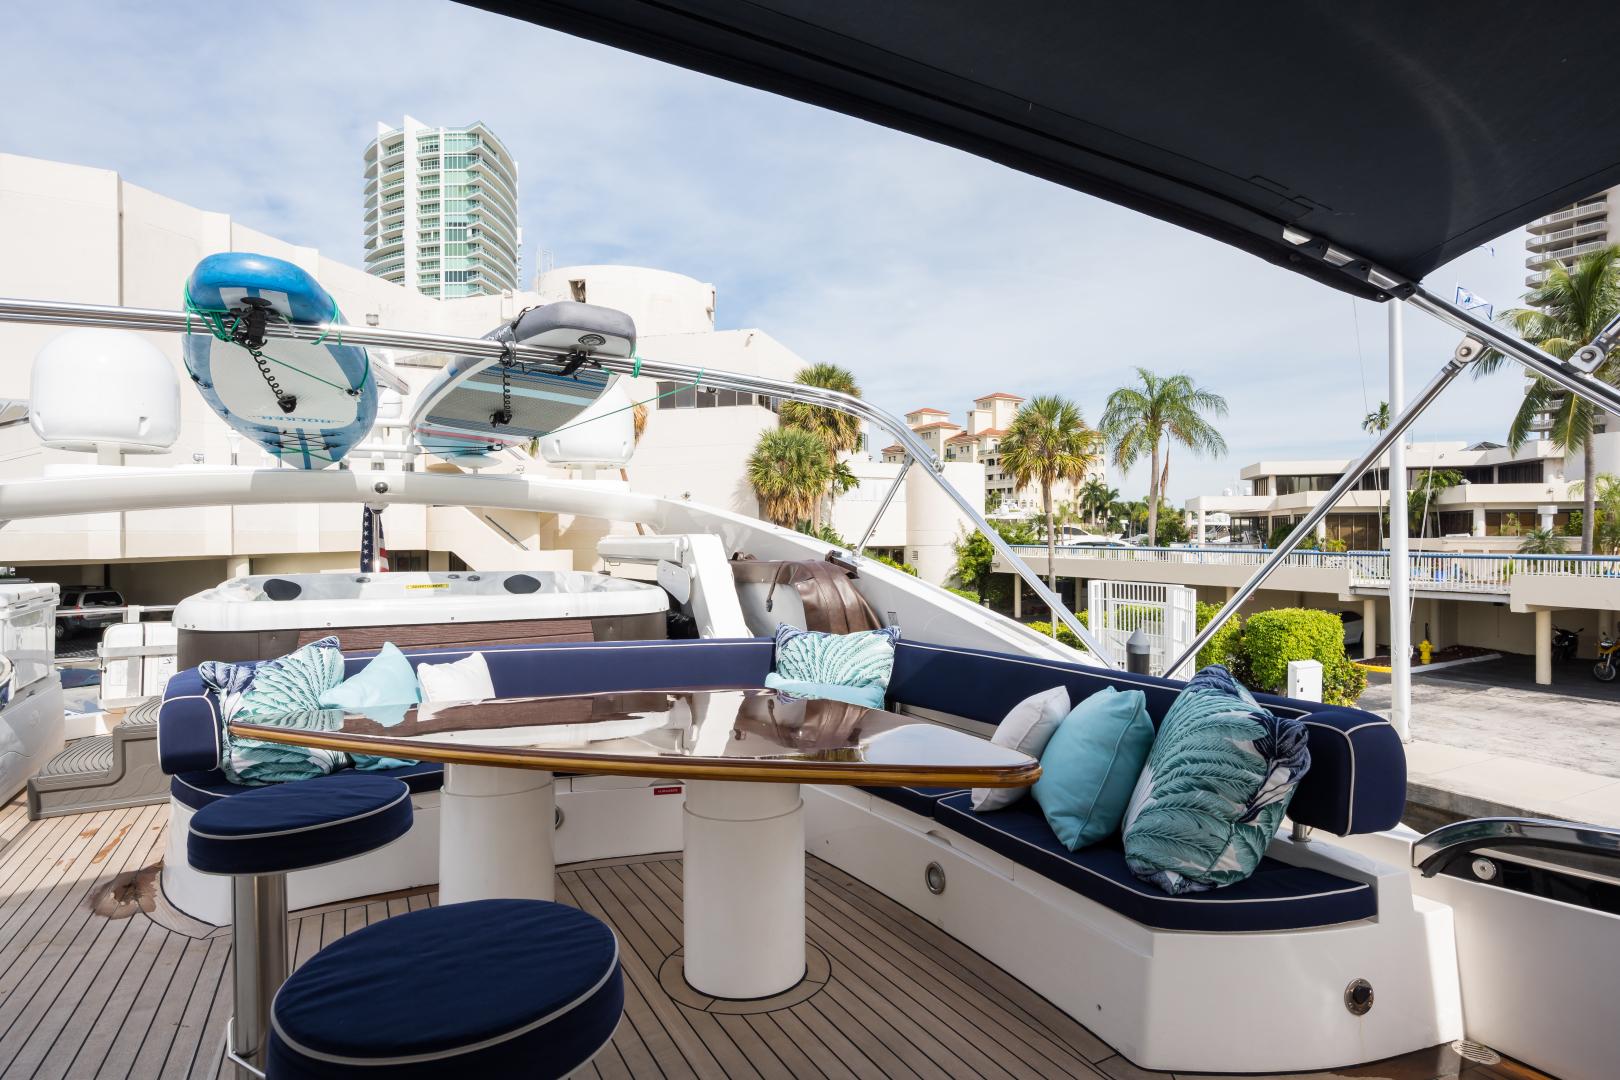 Sunseeker-Yacht 2004-TOP GUN Aventura-Florida-United States-1450719 | Thumbnail